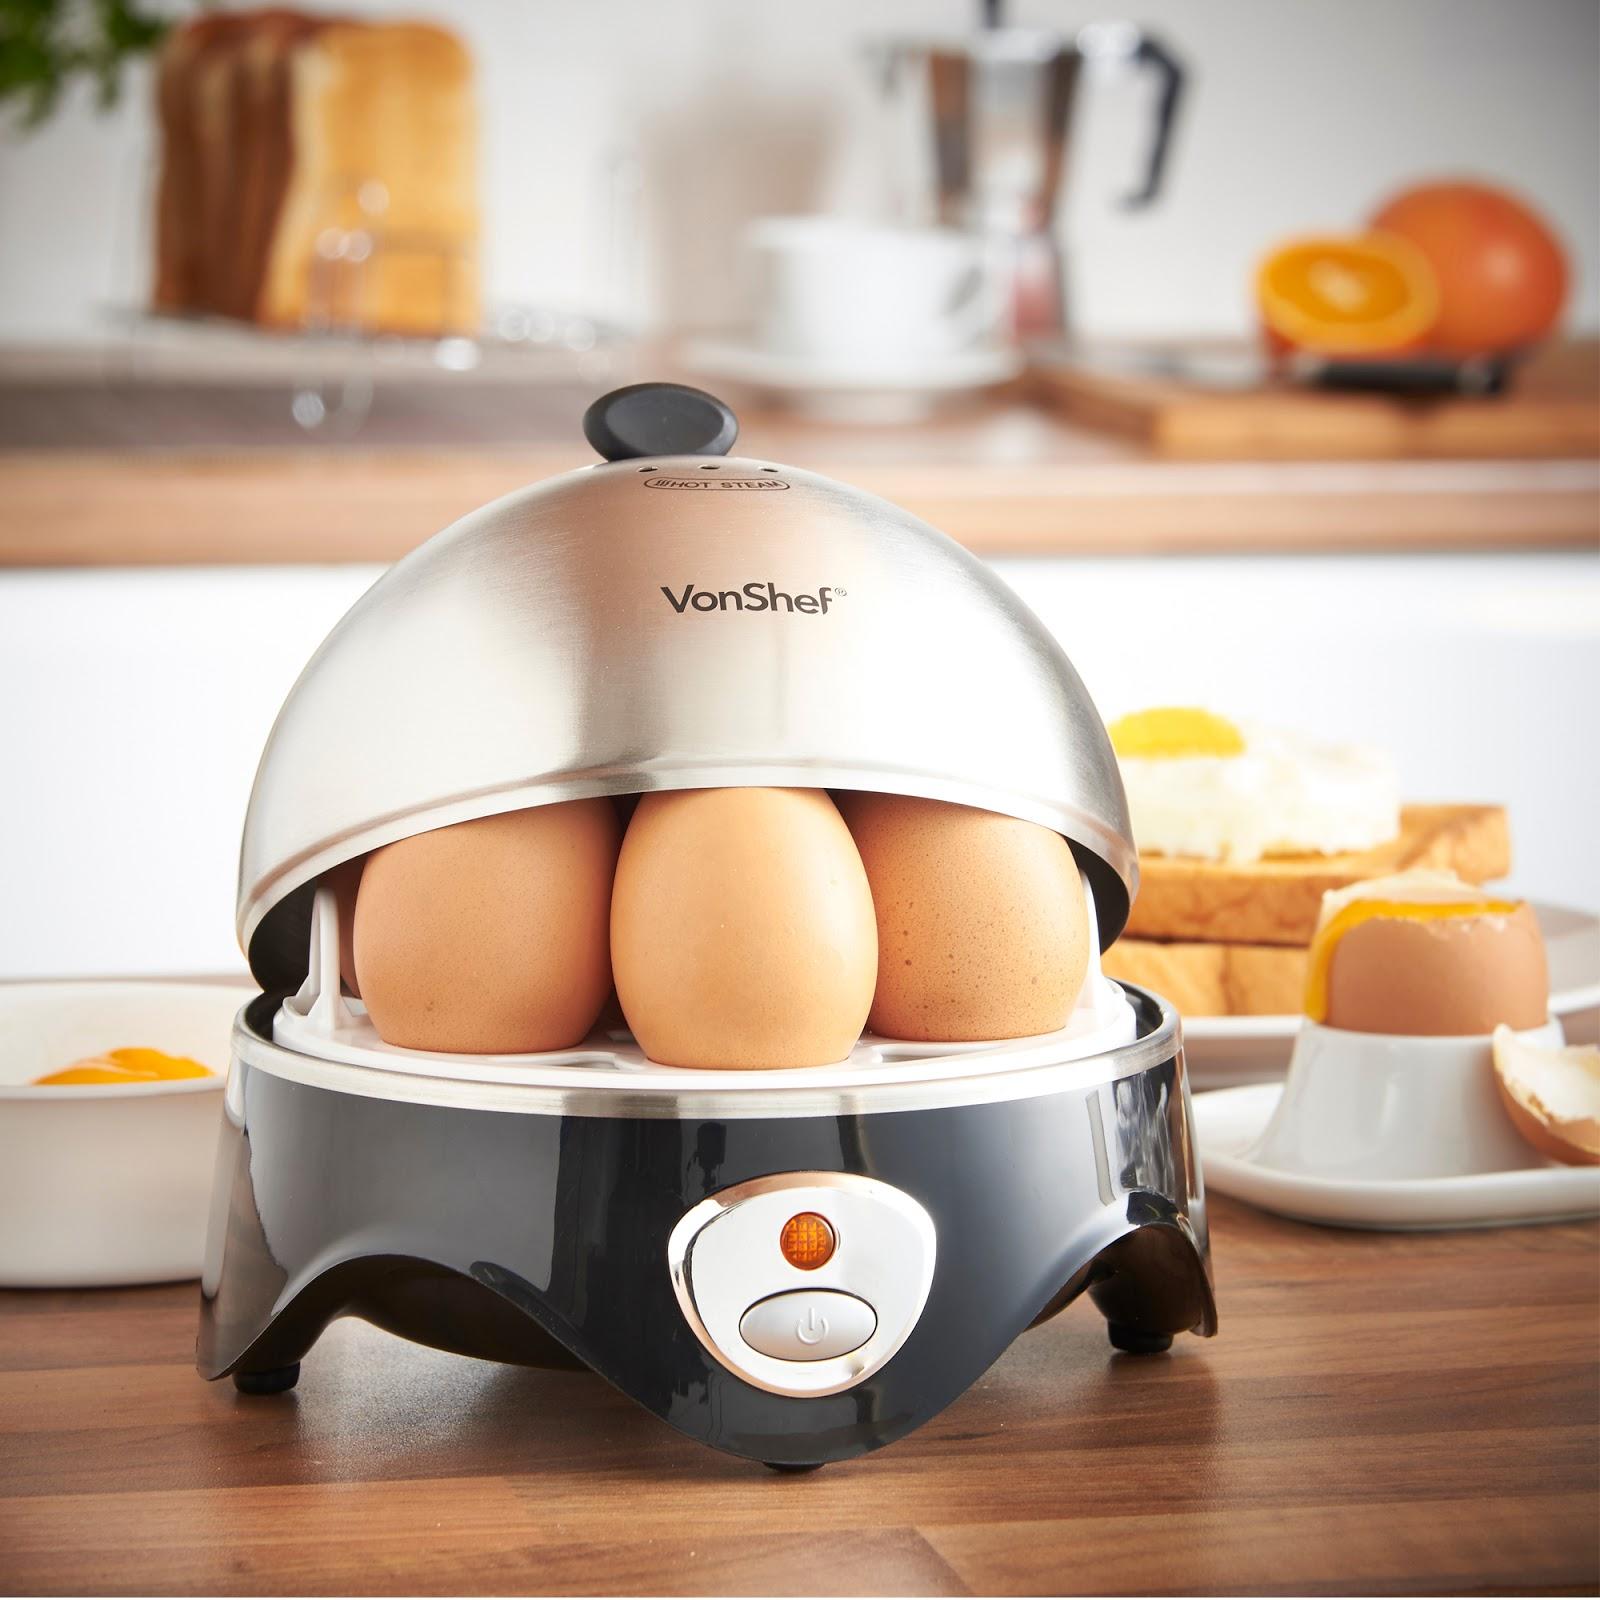 VonShef Egg Boiler